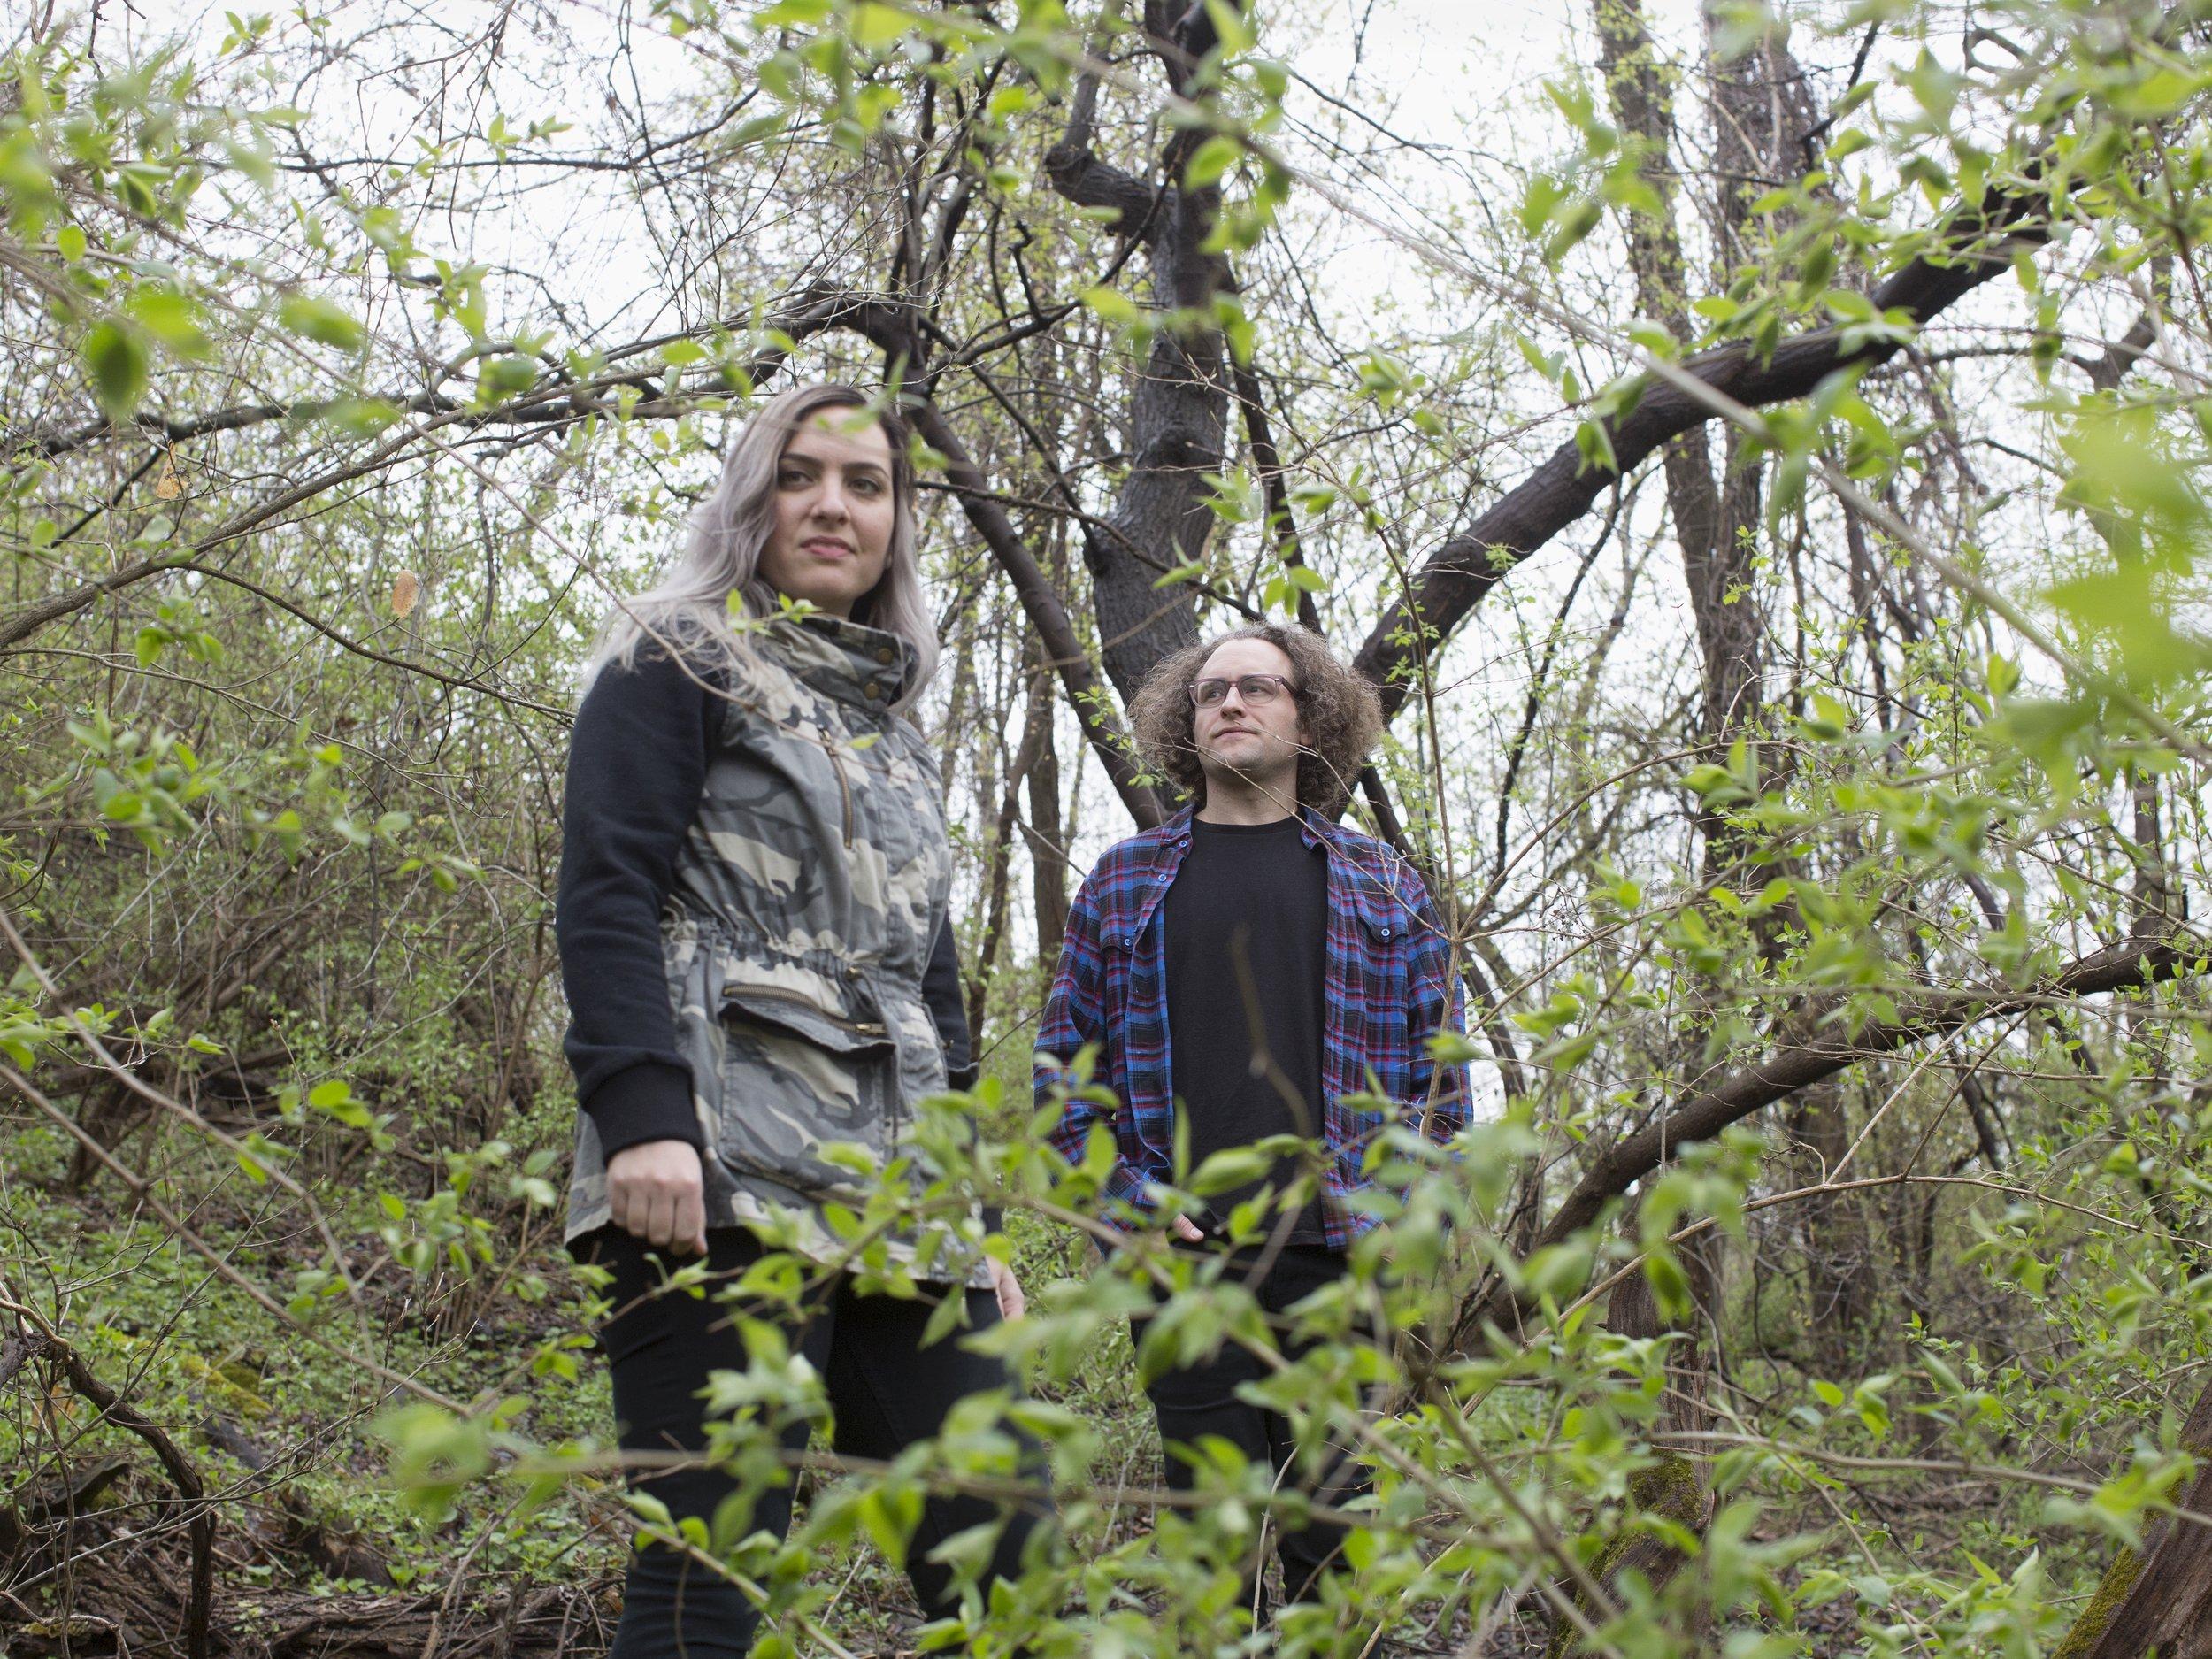 Bethlehem-based punk rock duo Slingshot Dakota will perform Feb. 14 at the Easton Public Market in Easton.  (Courtesy Photo)